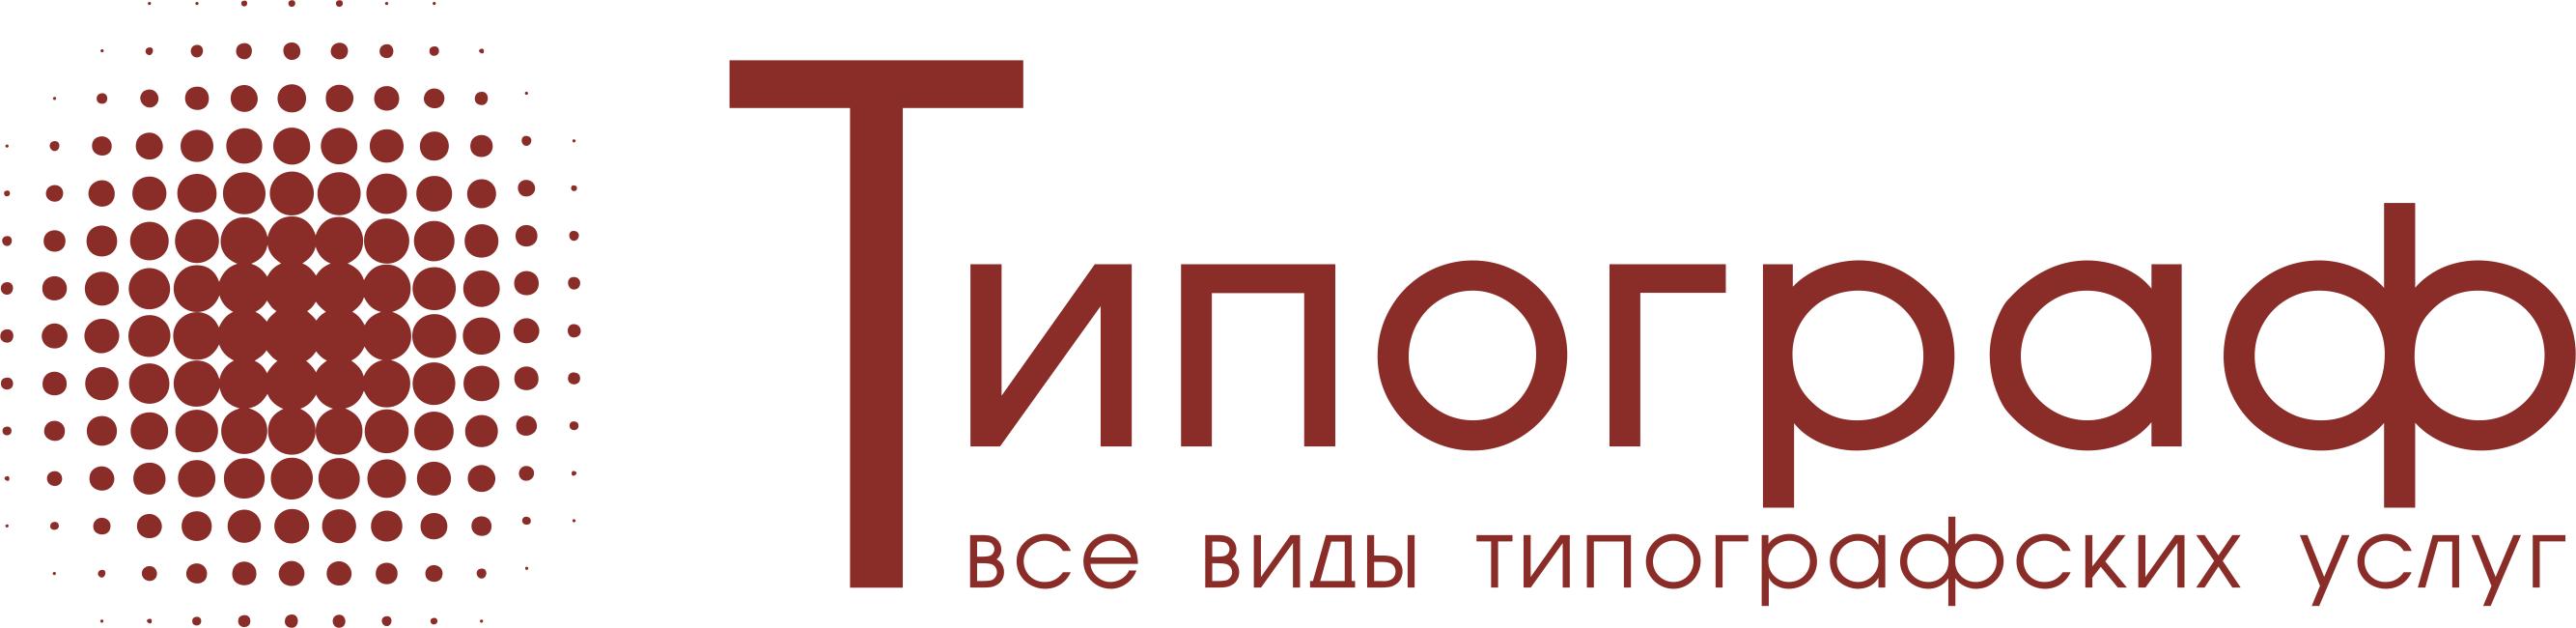 Логотип Типограф+